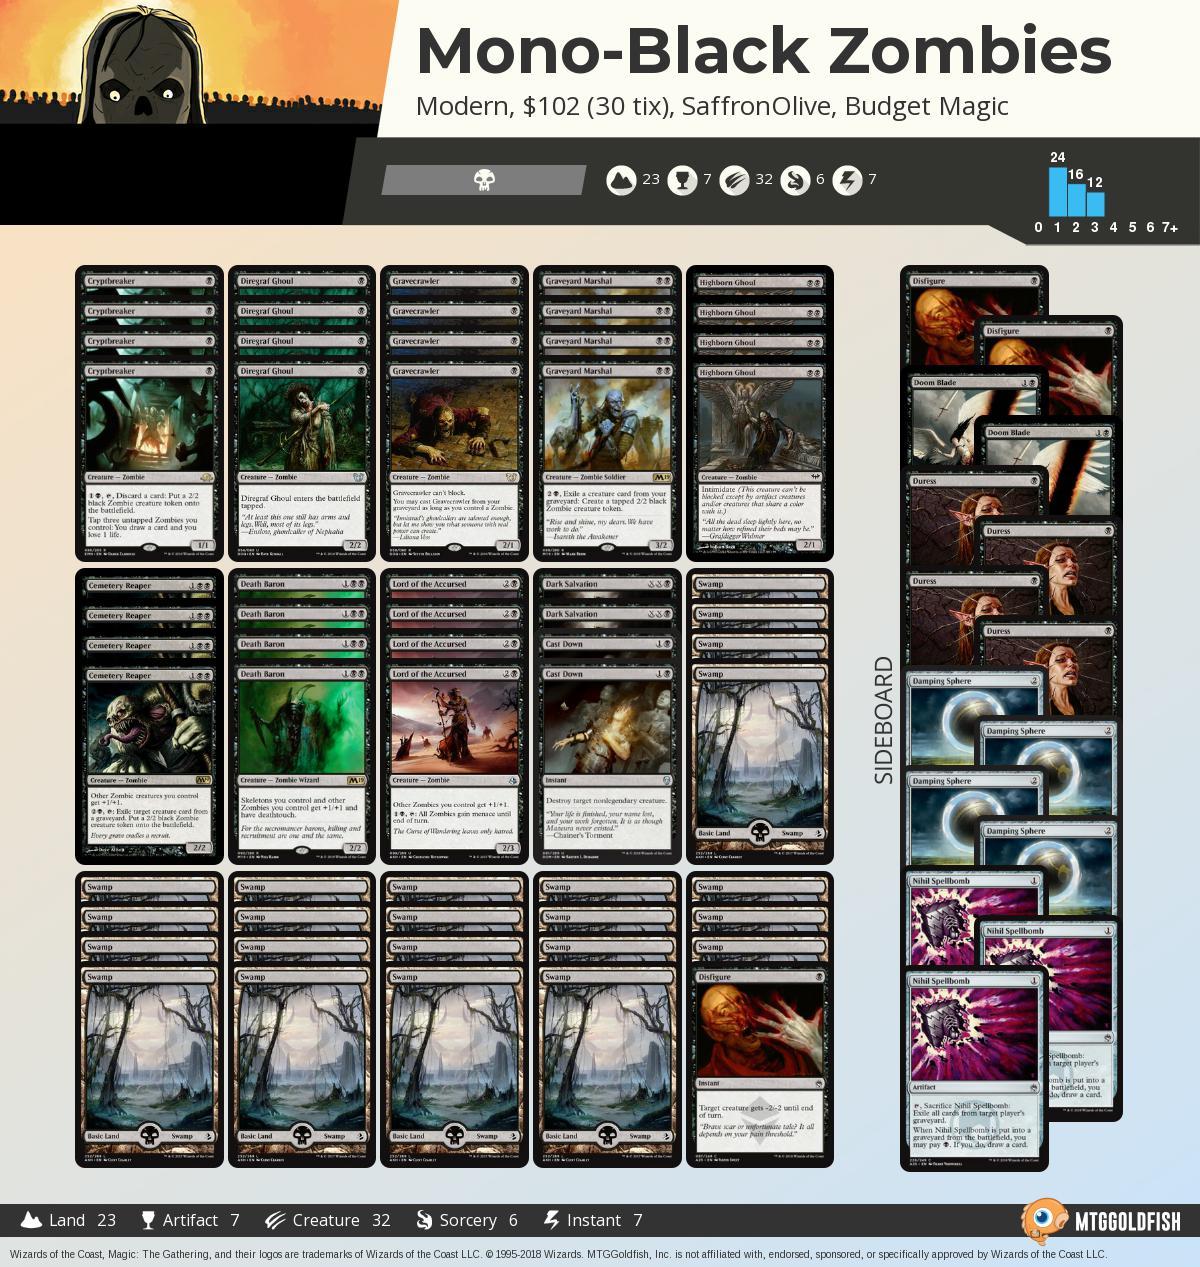 Mono black%2bzombies 53f822c9 b085 4d62 bd37 28b7909800d9%2ejpg